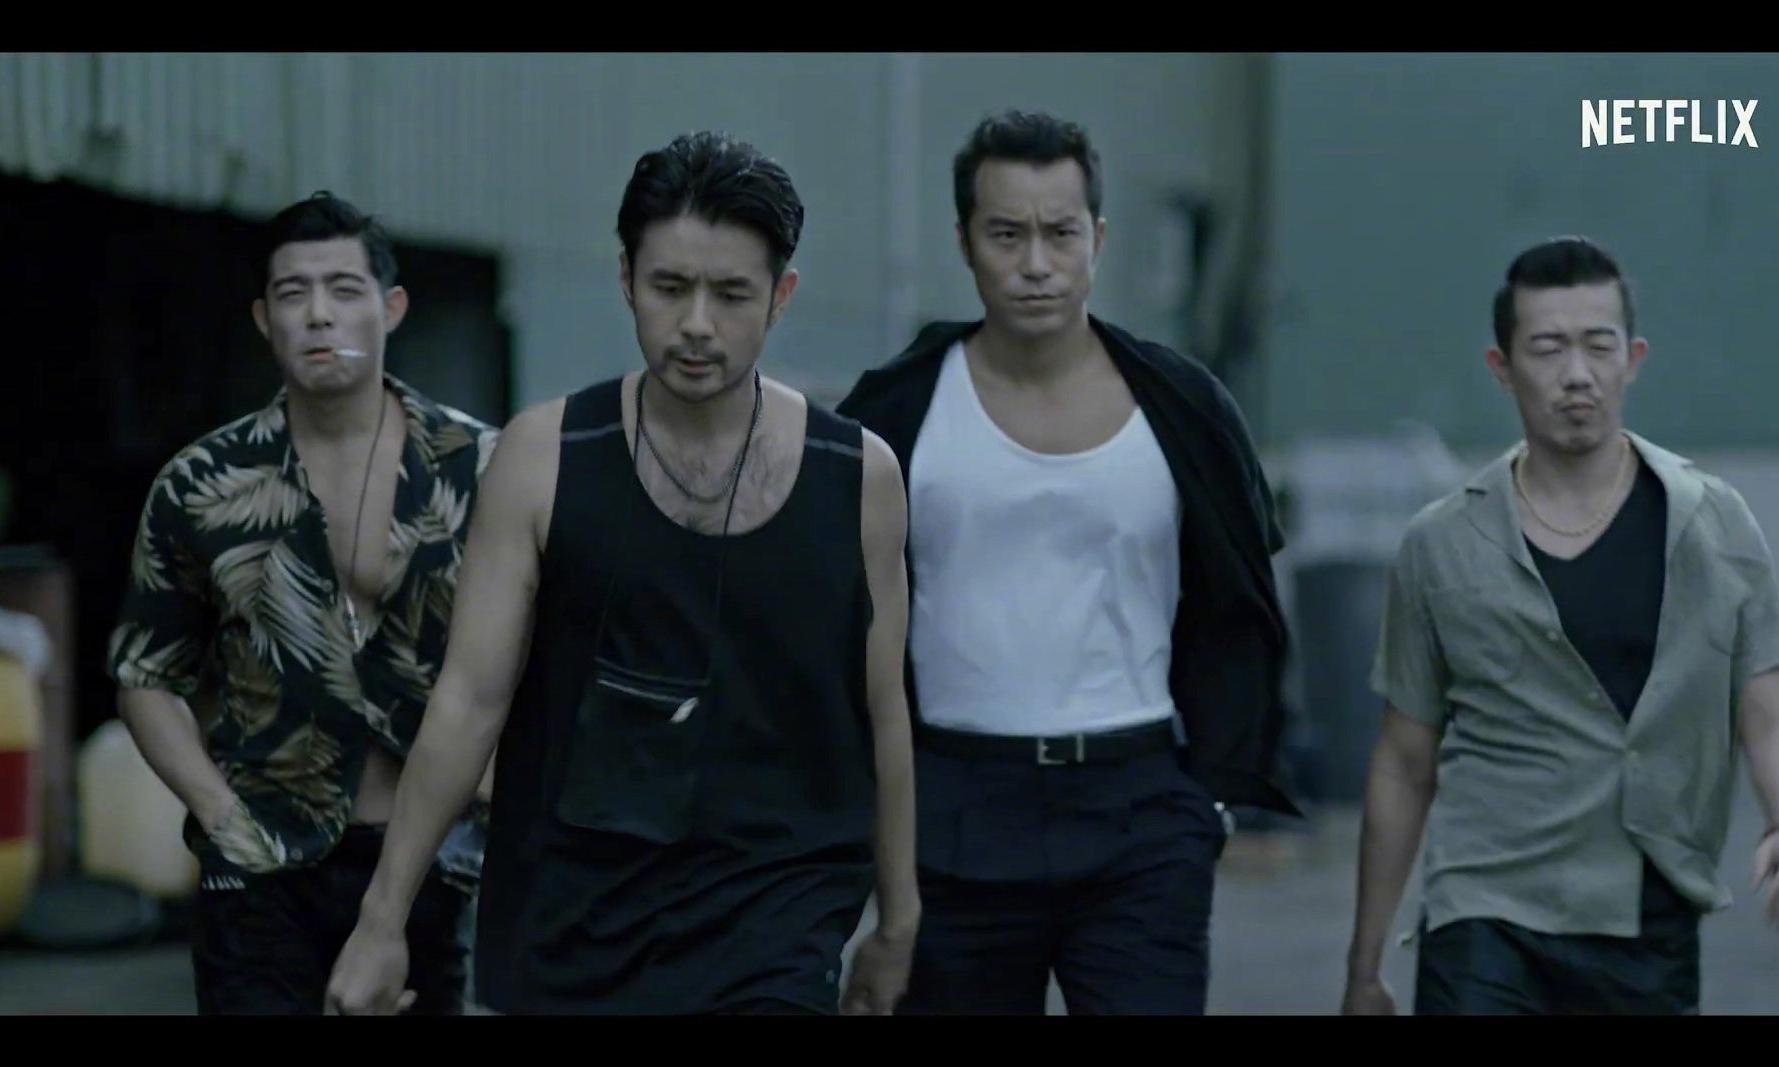 Netflix 首部原创华语剧集《罪梦者》公布先导预告